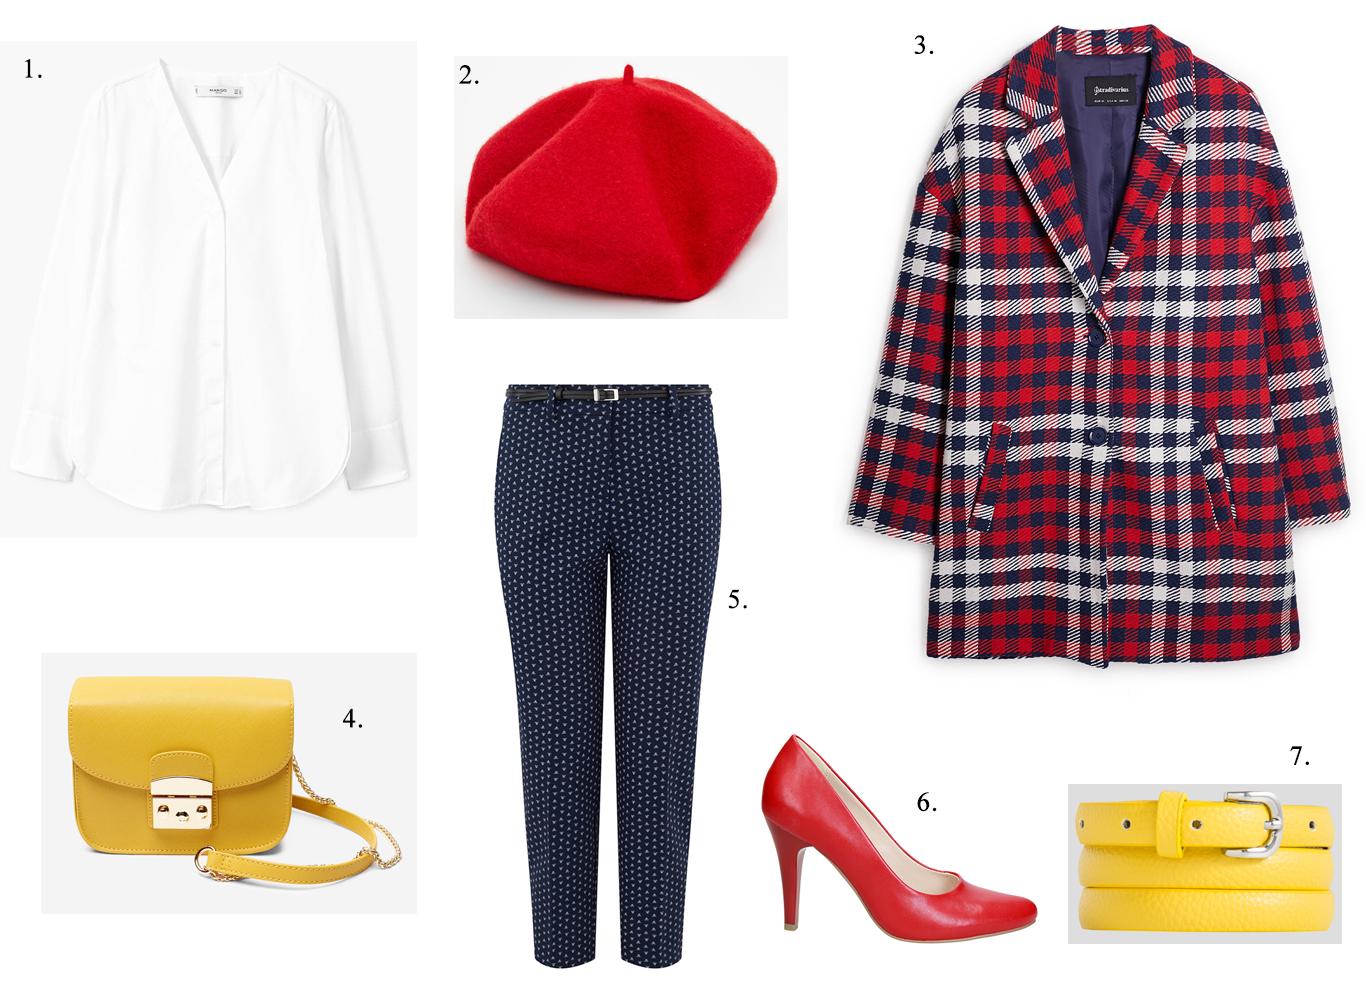 sarga_piros_kek_outfit.png